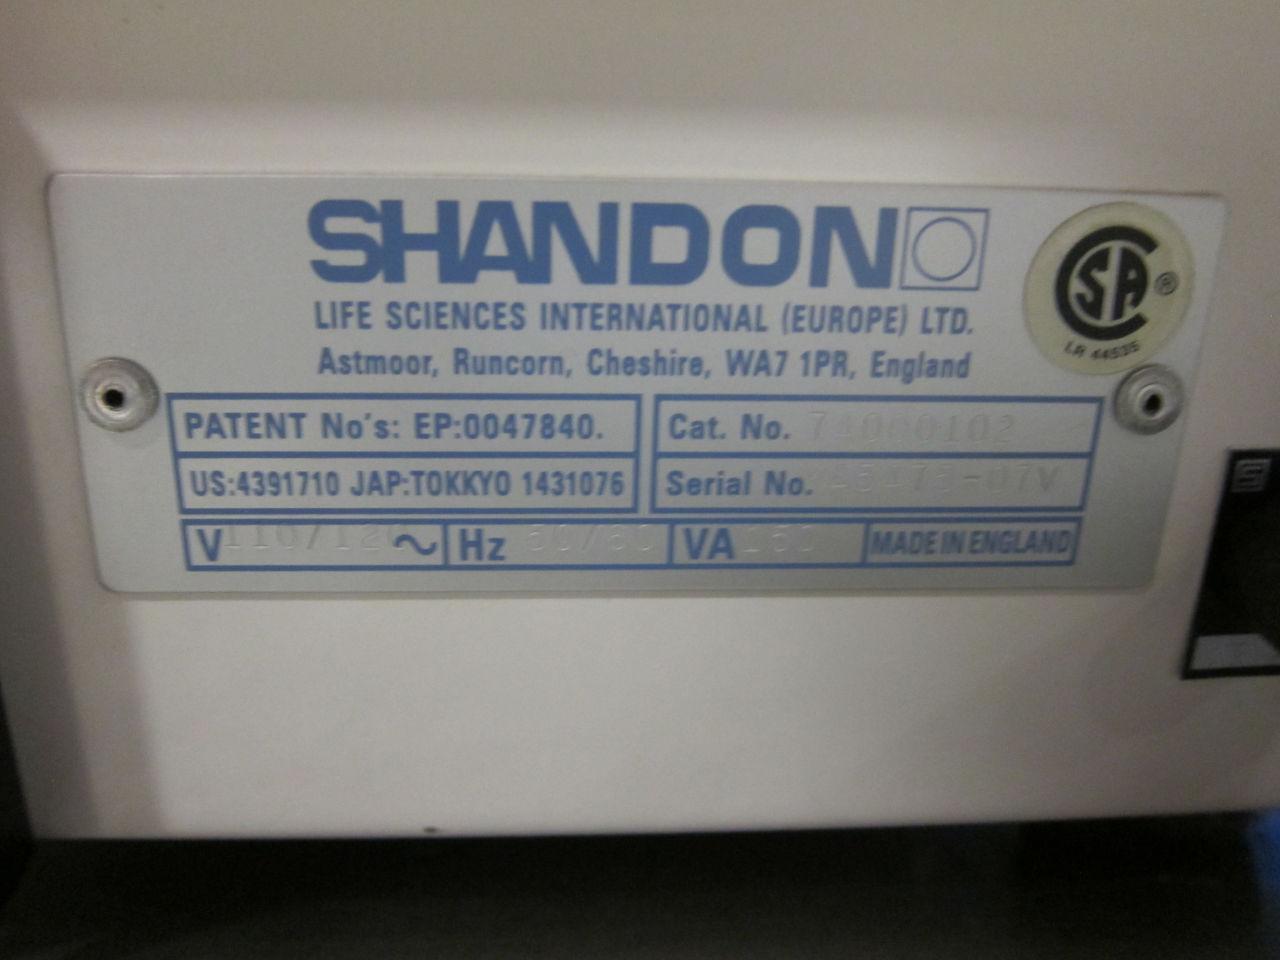 SHANDON Cytospin 3 Centrifuge